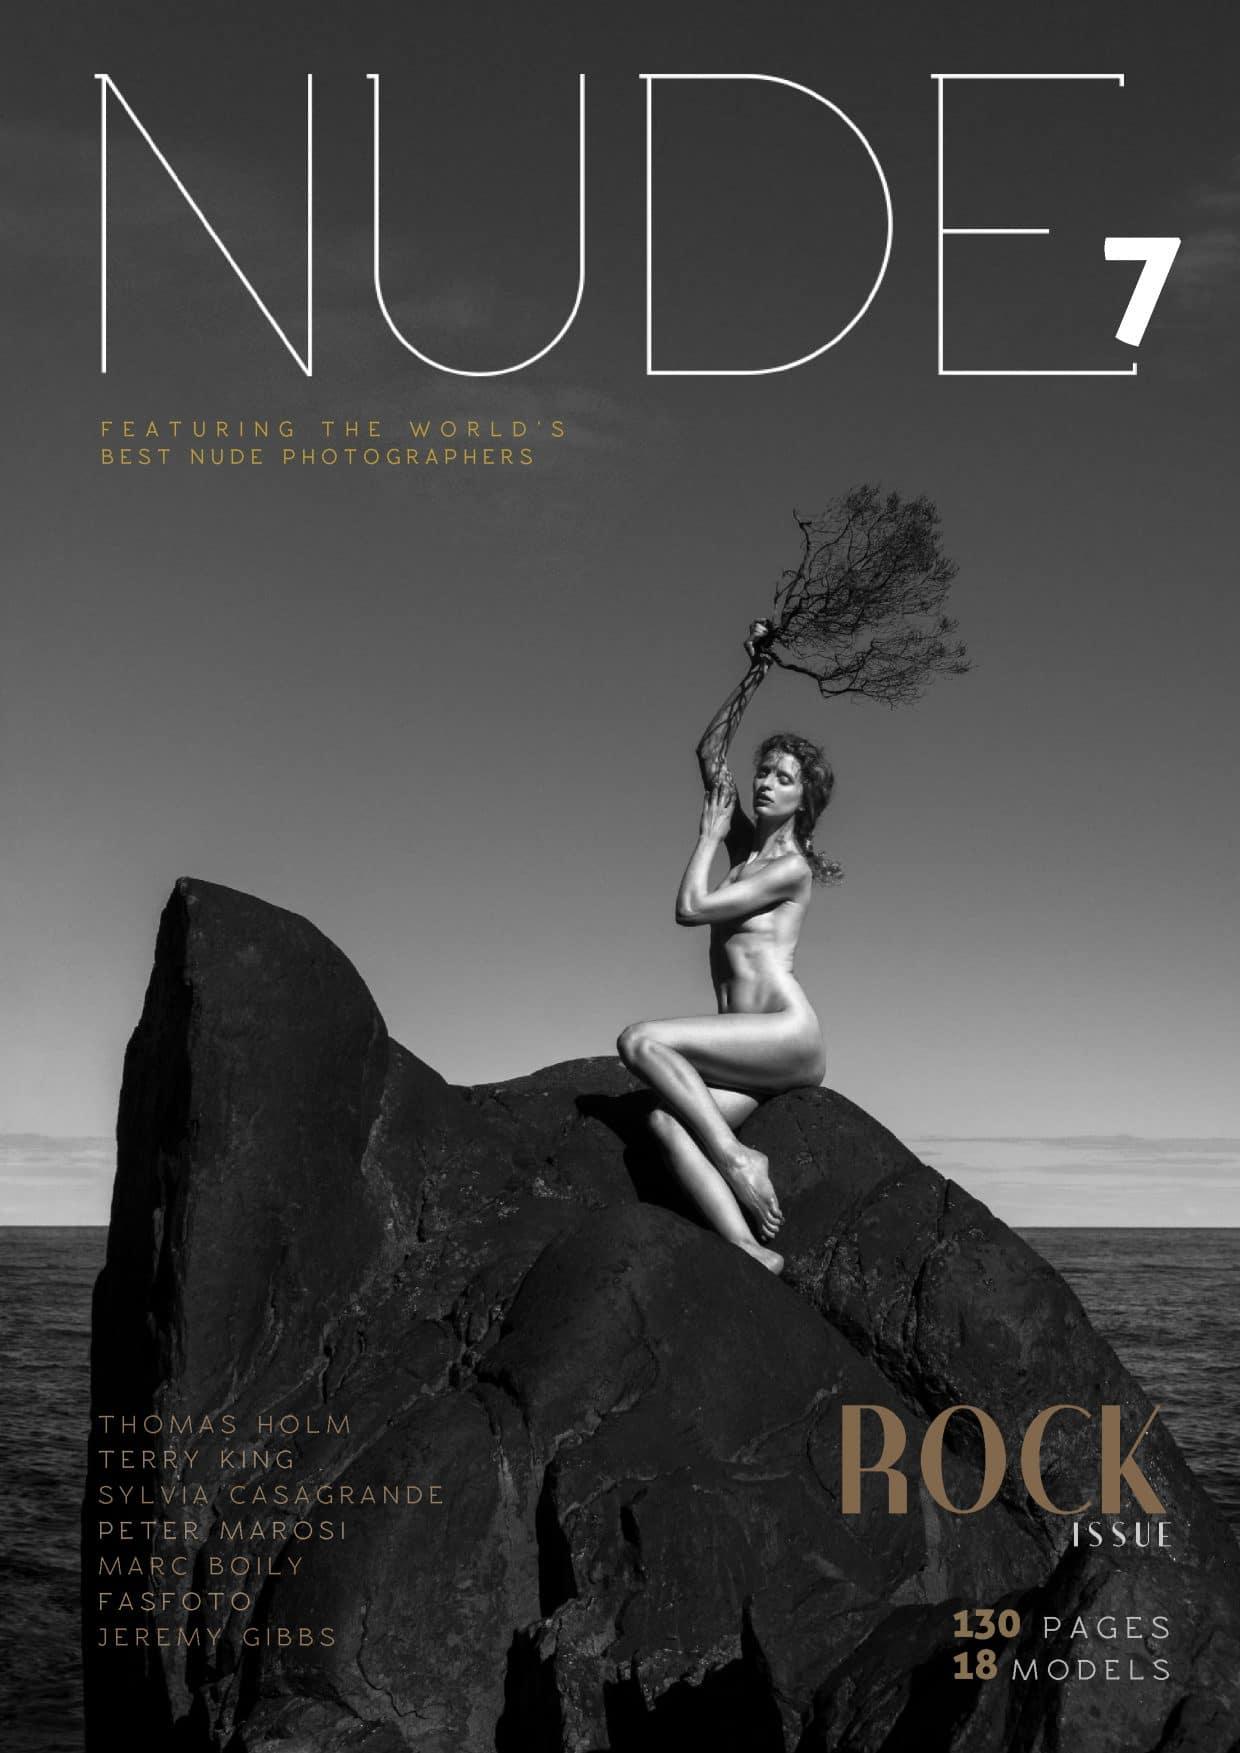 Nude Magazine - Numero 7 - Rock Issue